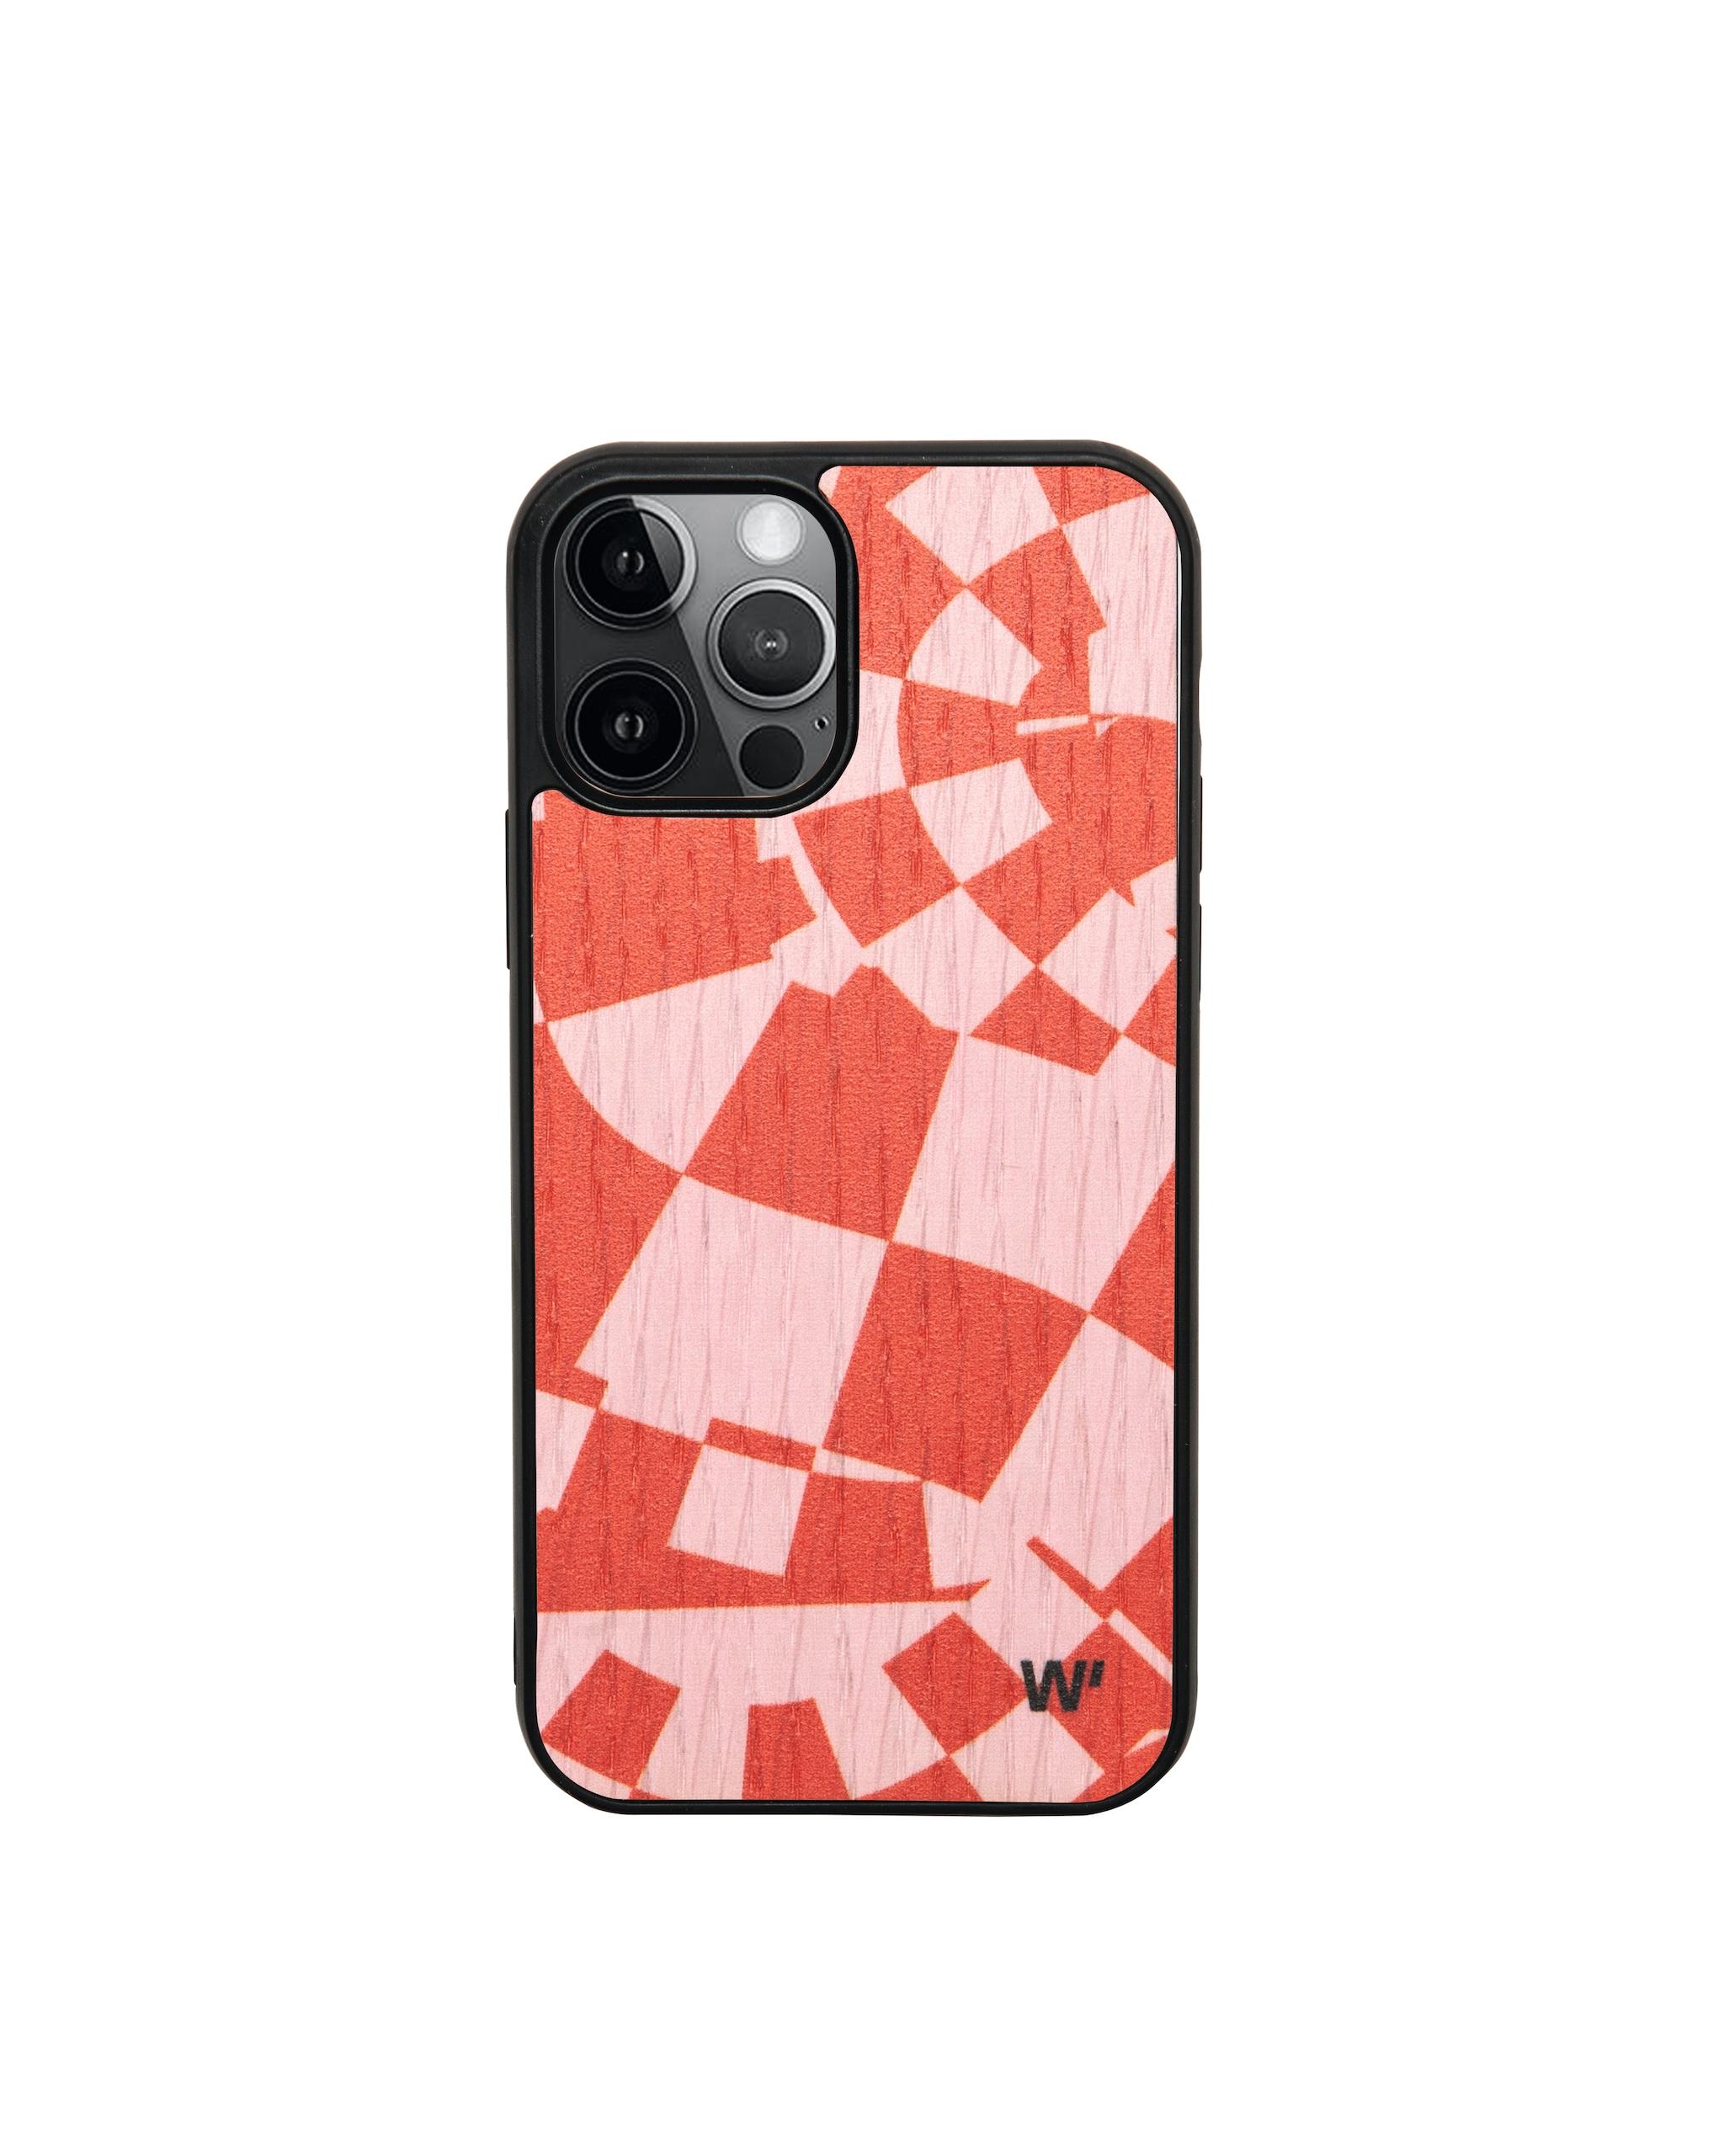 Cover in legno intarsiato per iPhone 12, Fluid Chess WOOD'D (39,90 €).